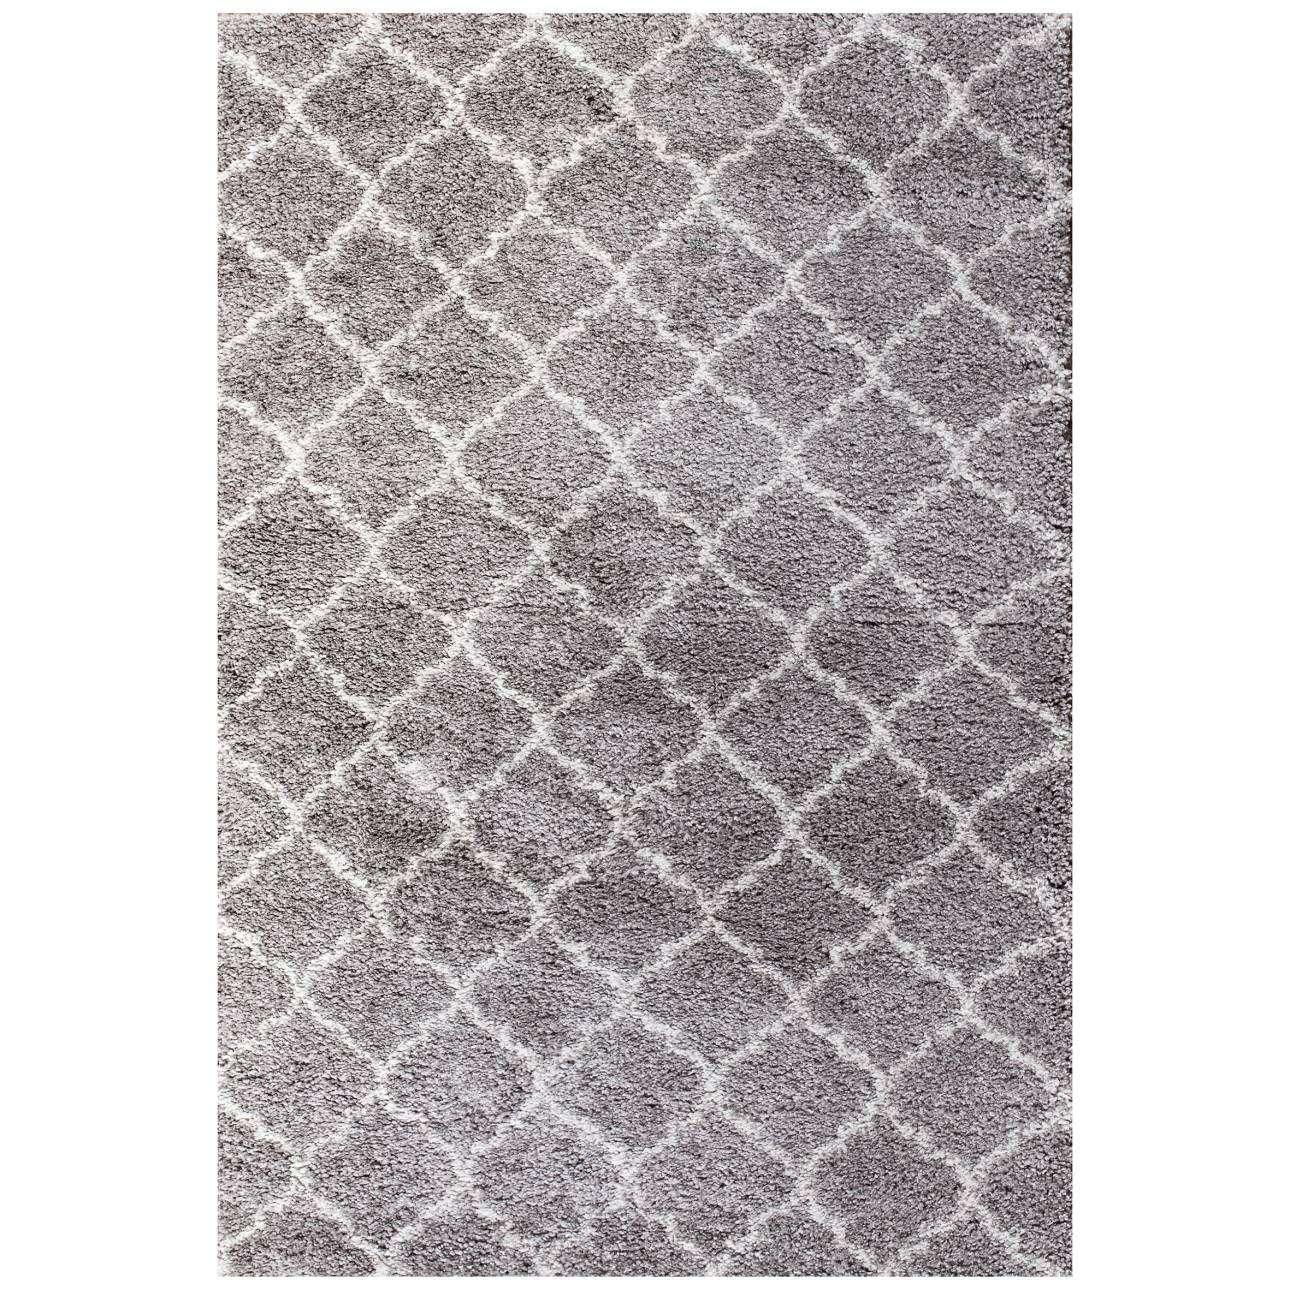 Dywan Royal Marocco light grey/cream 120x170cm 120x170cm